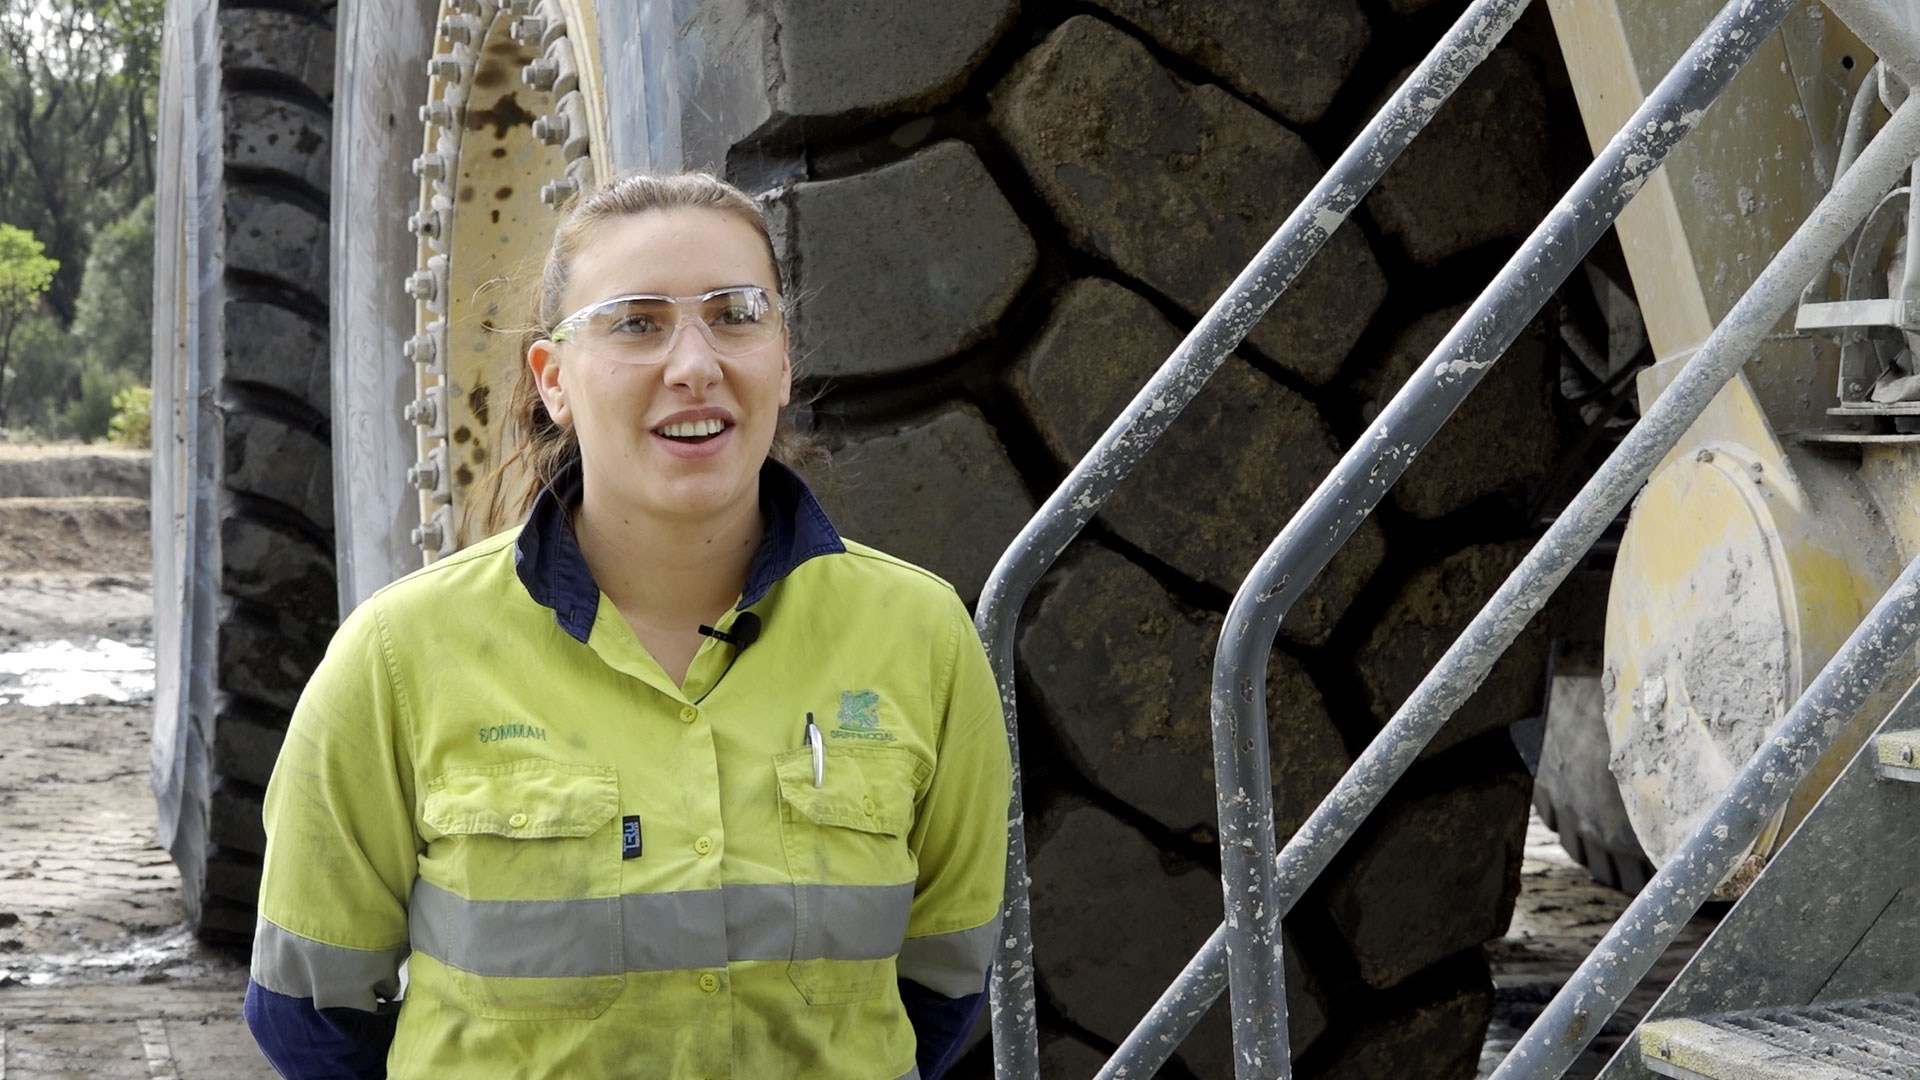 Griffin Coal apprentice Summah Marshall